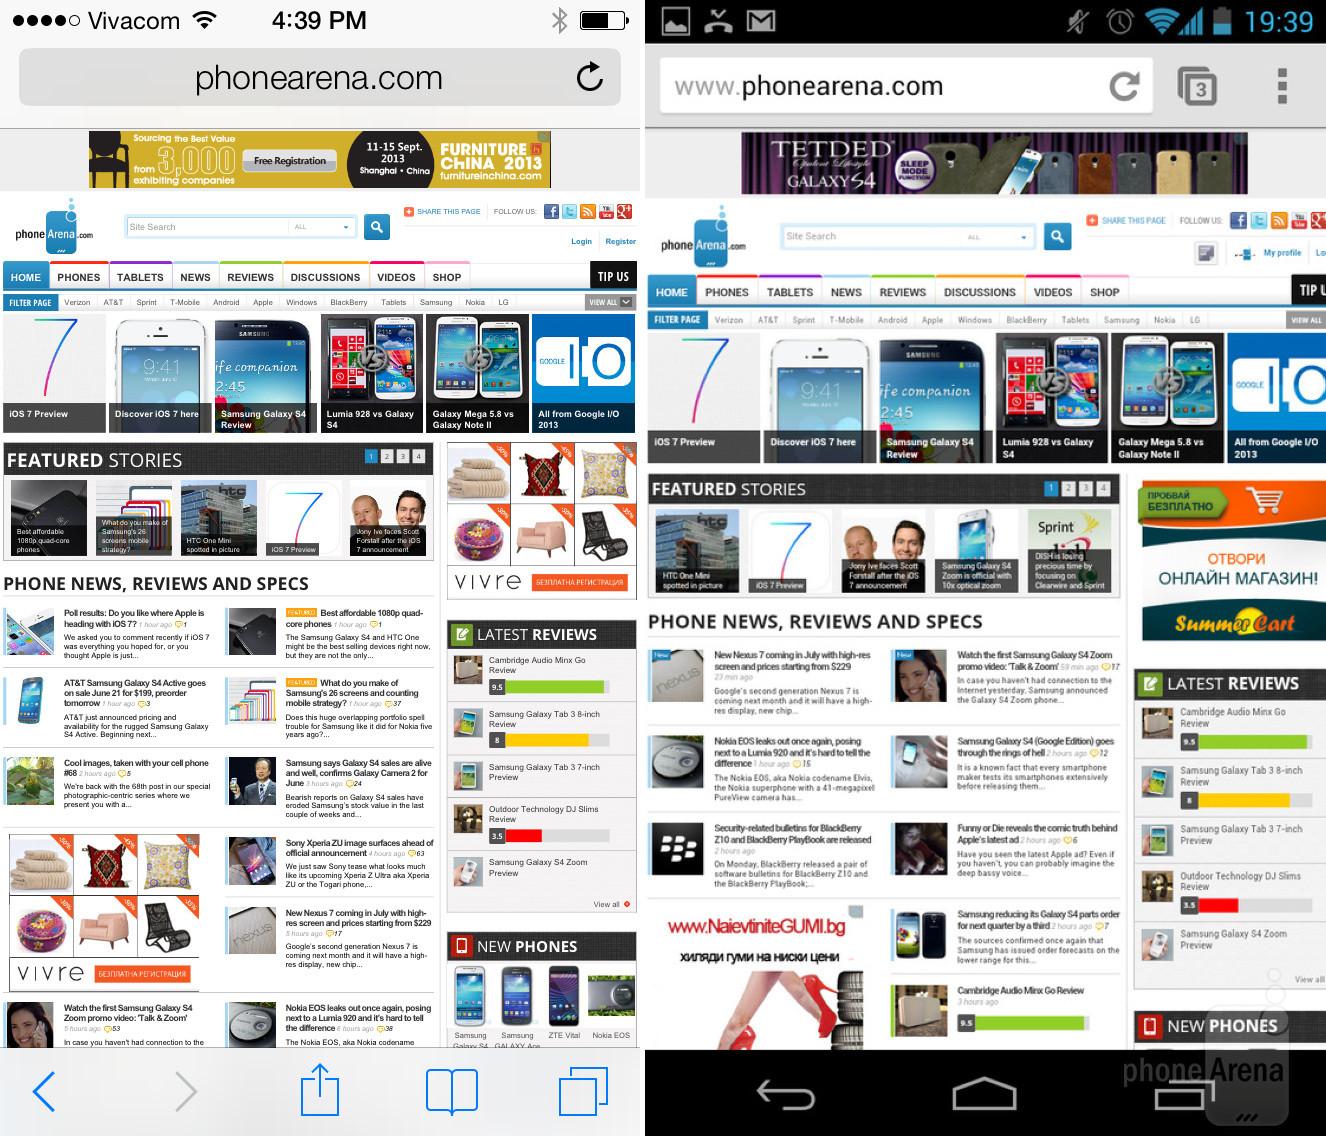 Web-Browser.jpg